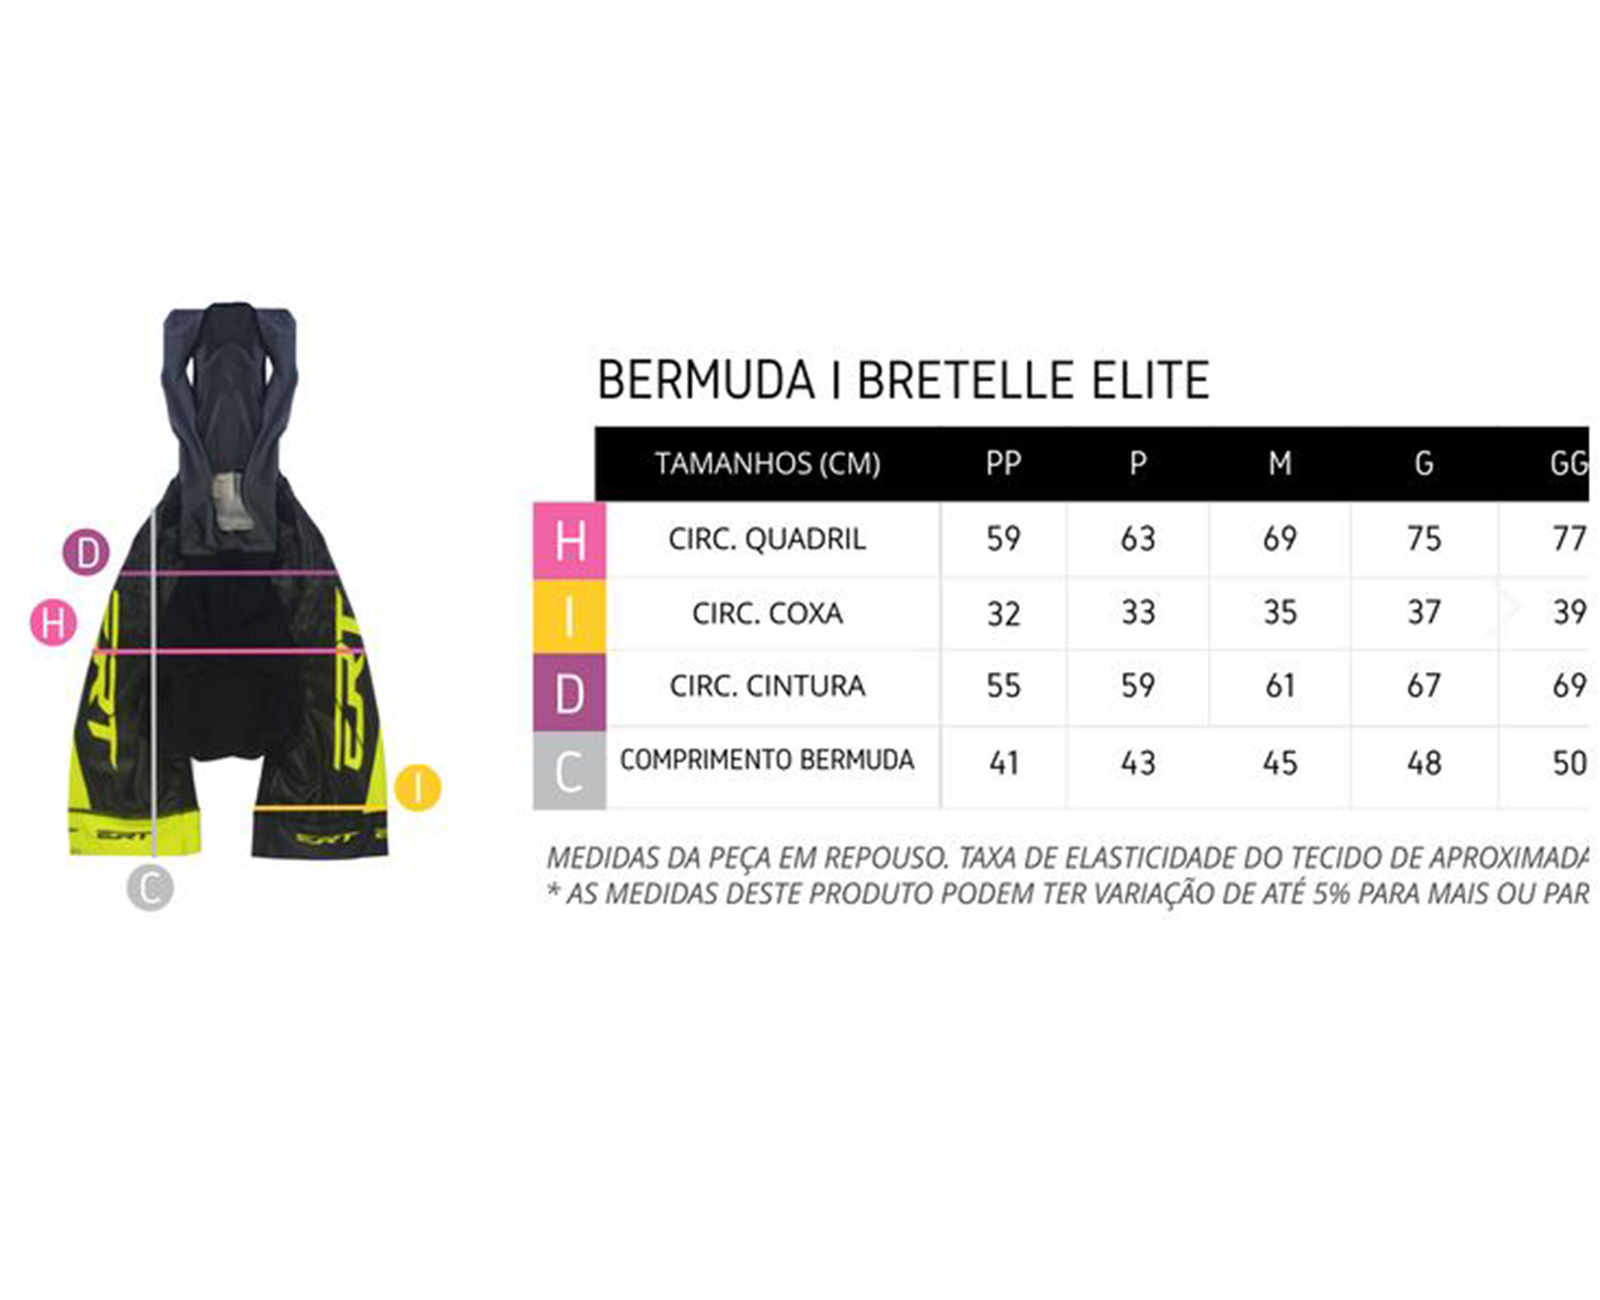 Bretelle Elite Racing Forro Gel Preto/Branco - ERT